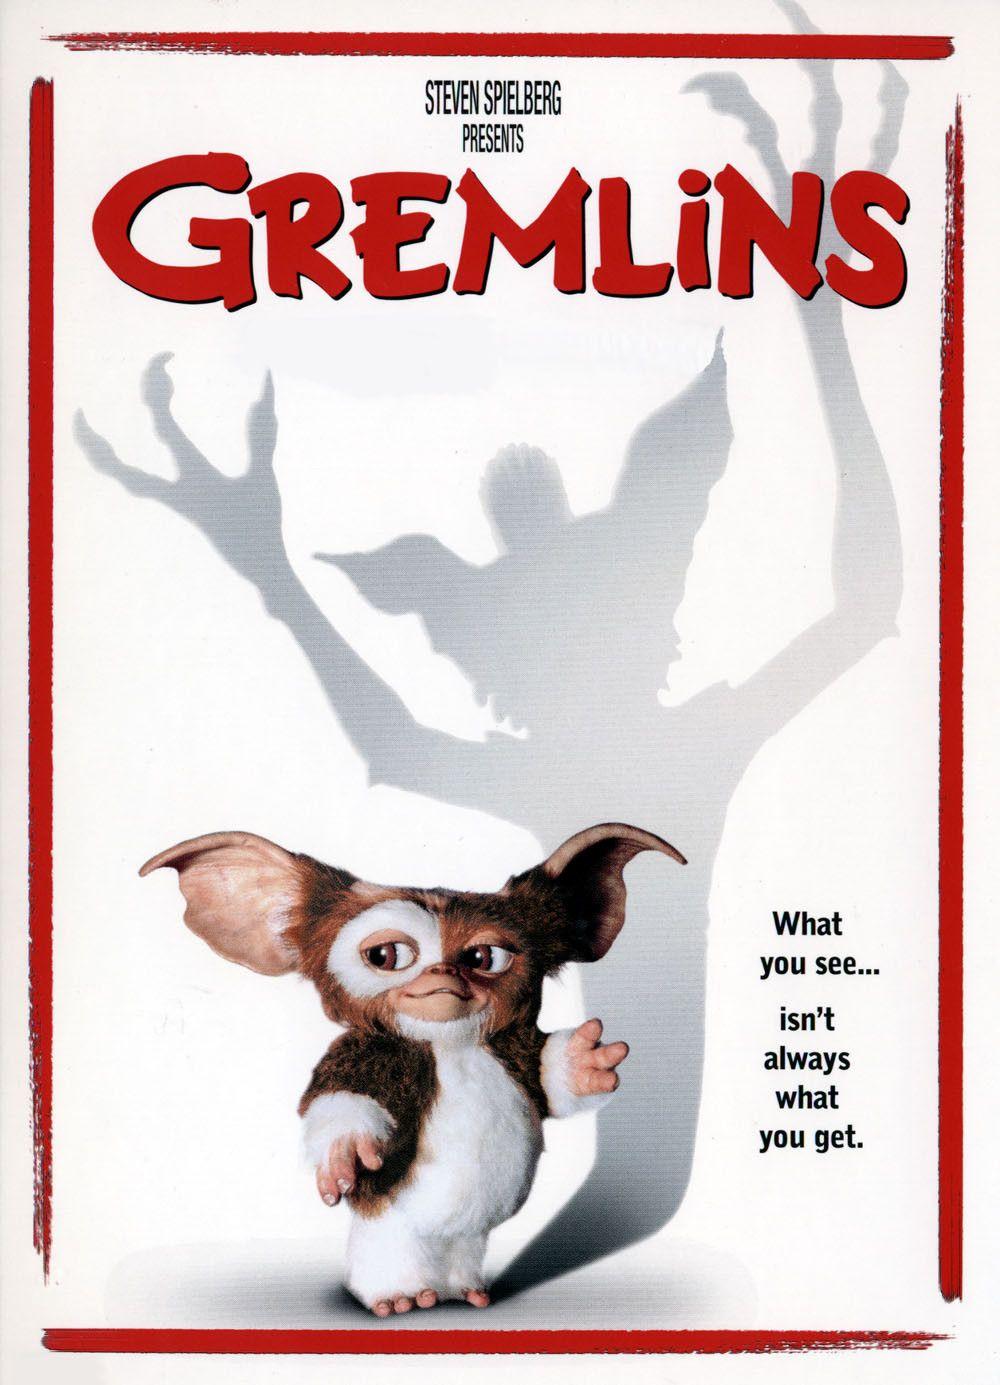 Gremlins!   OMG it's giving me flashbacks of my childhood. I've always wanted a mogwai